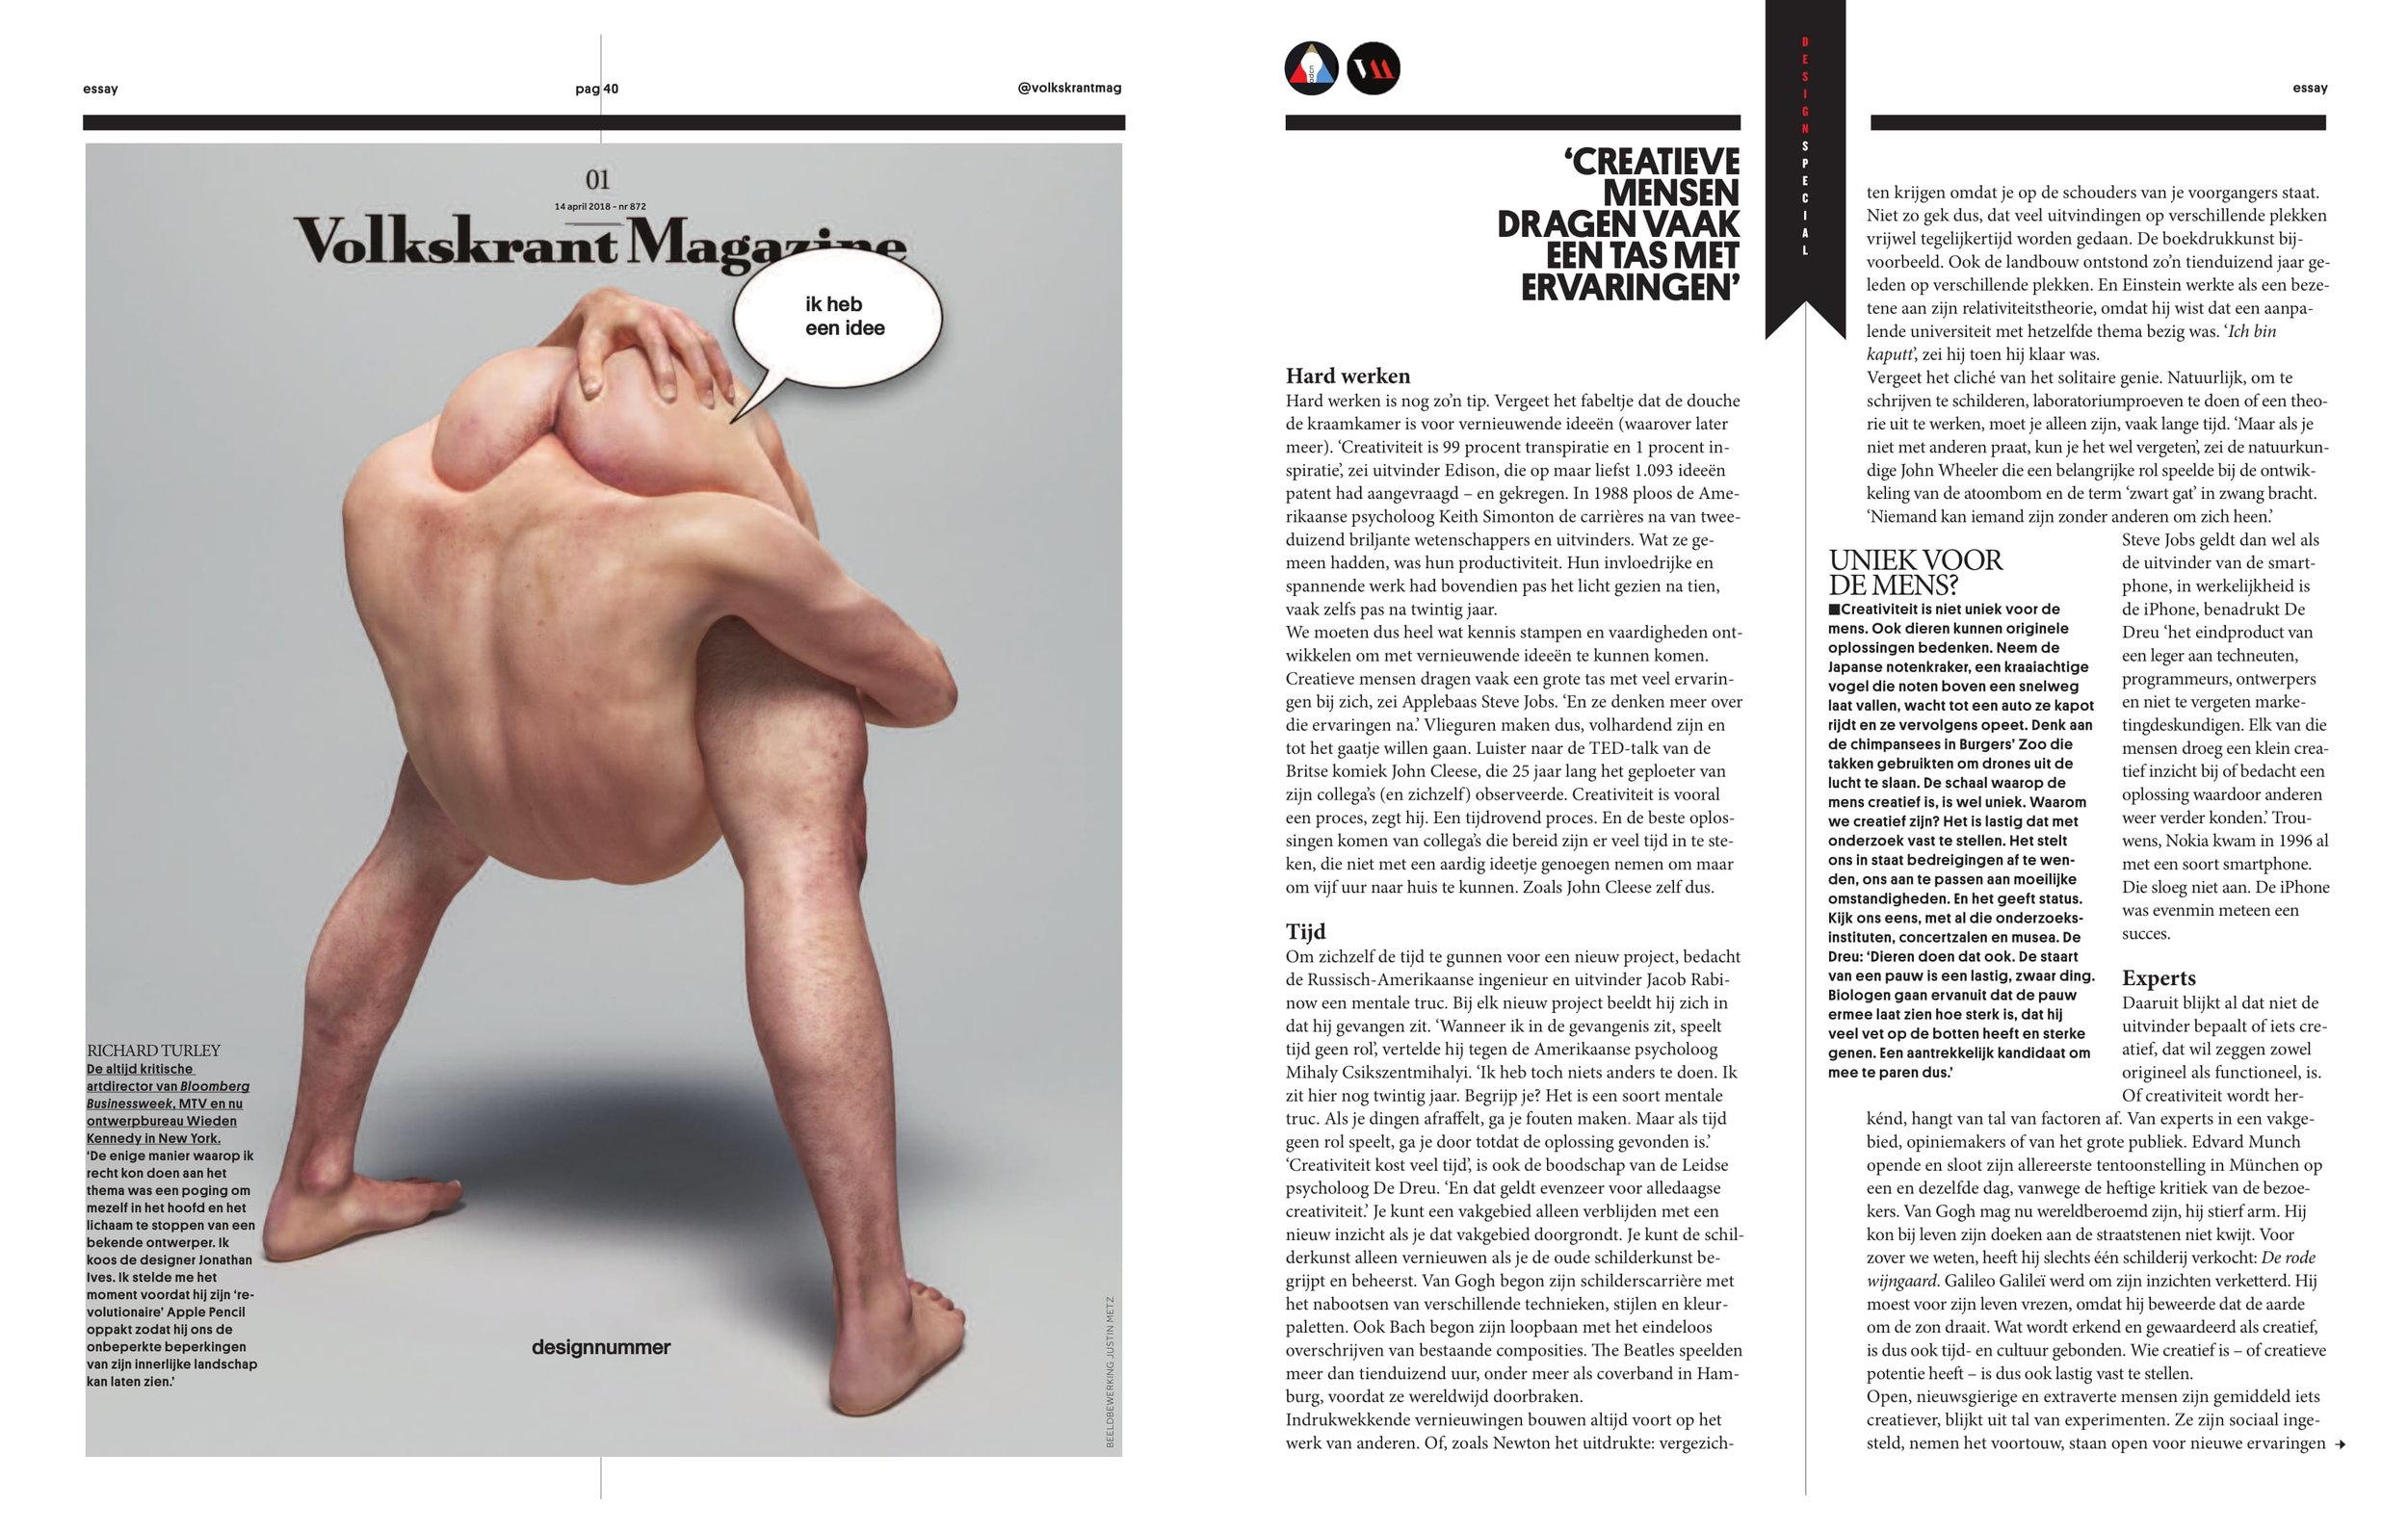 about creativity artikel-3.jpg